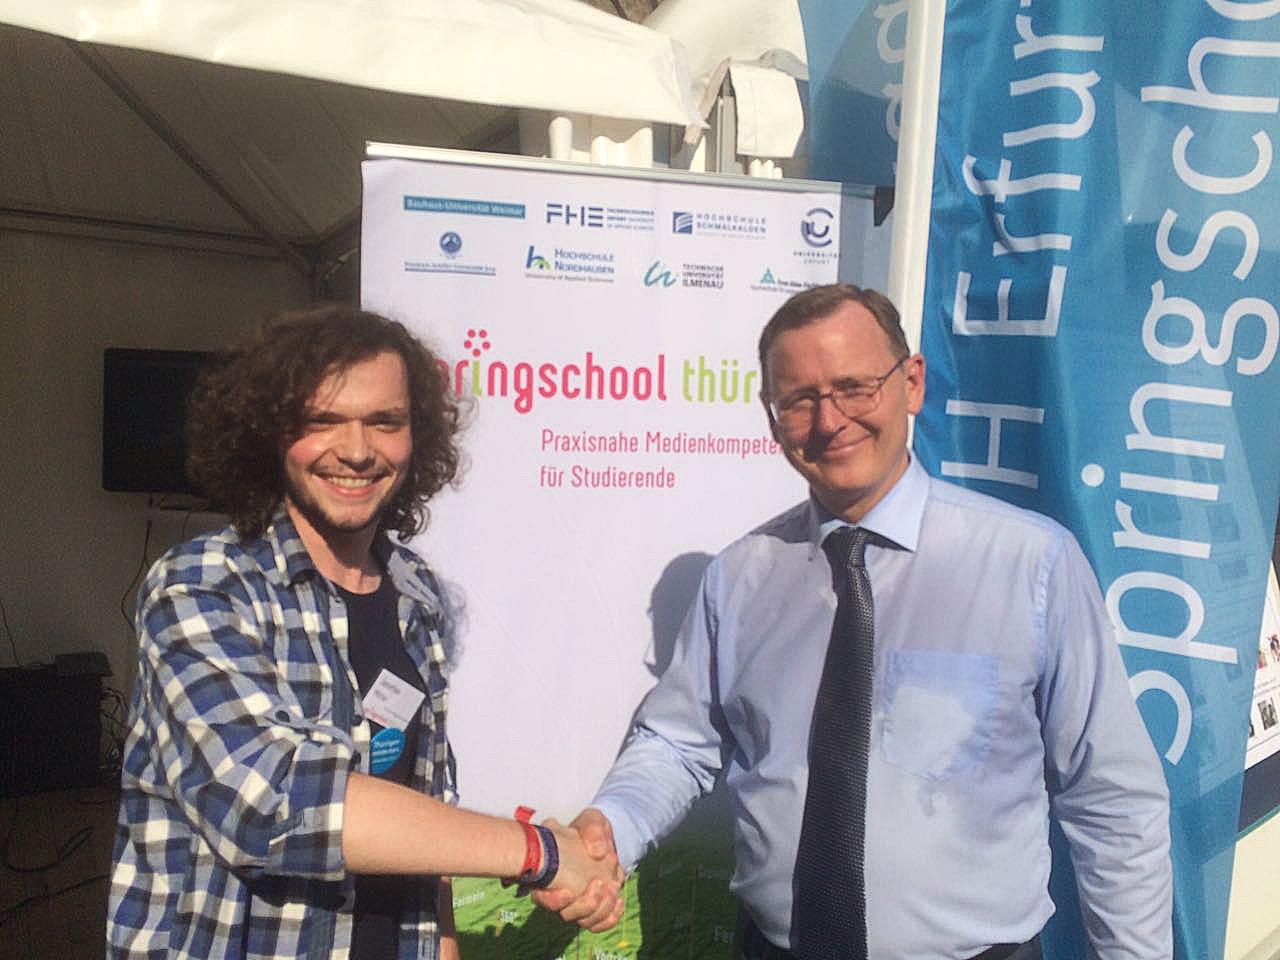 Springschool-Präsentation beim Sommerfest in Berlin